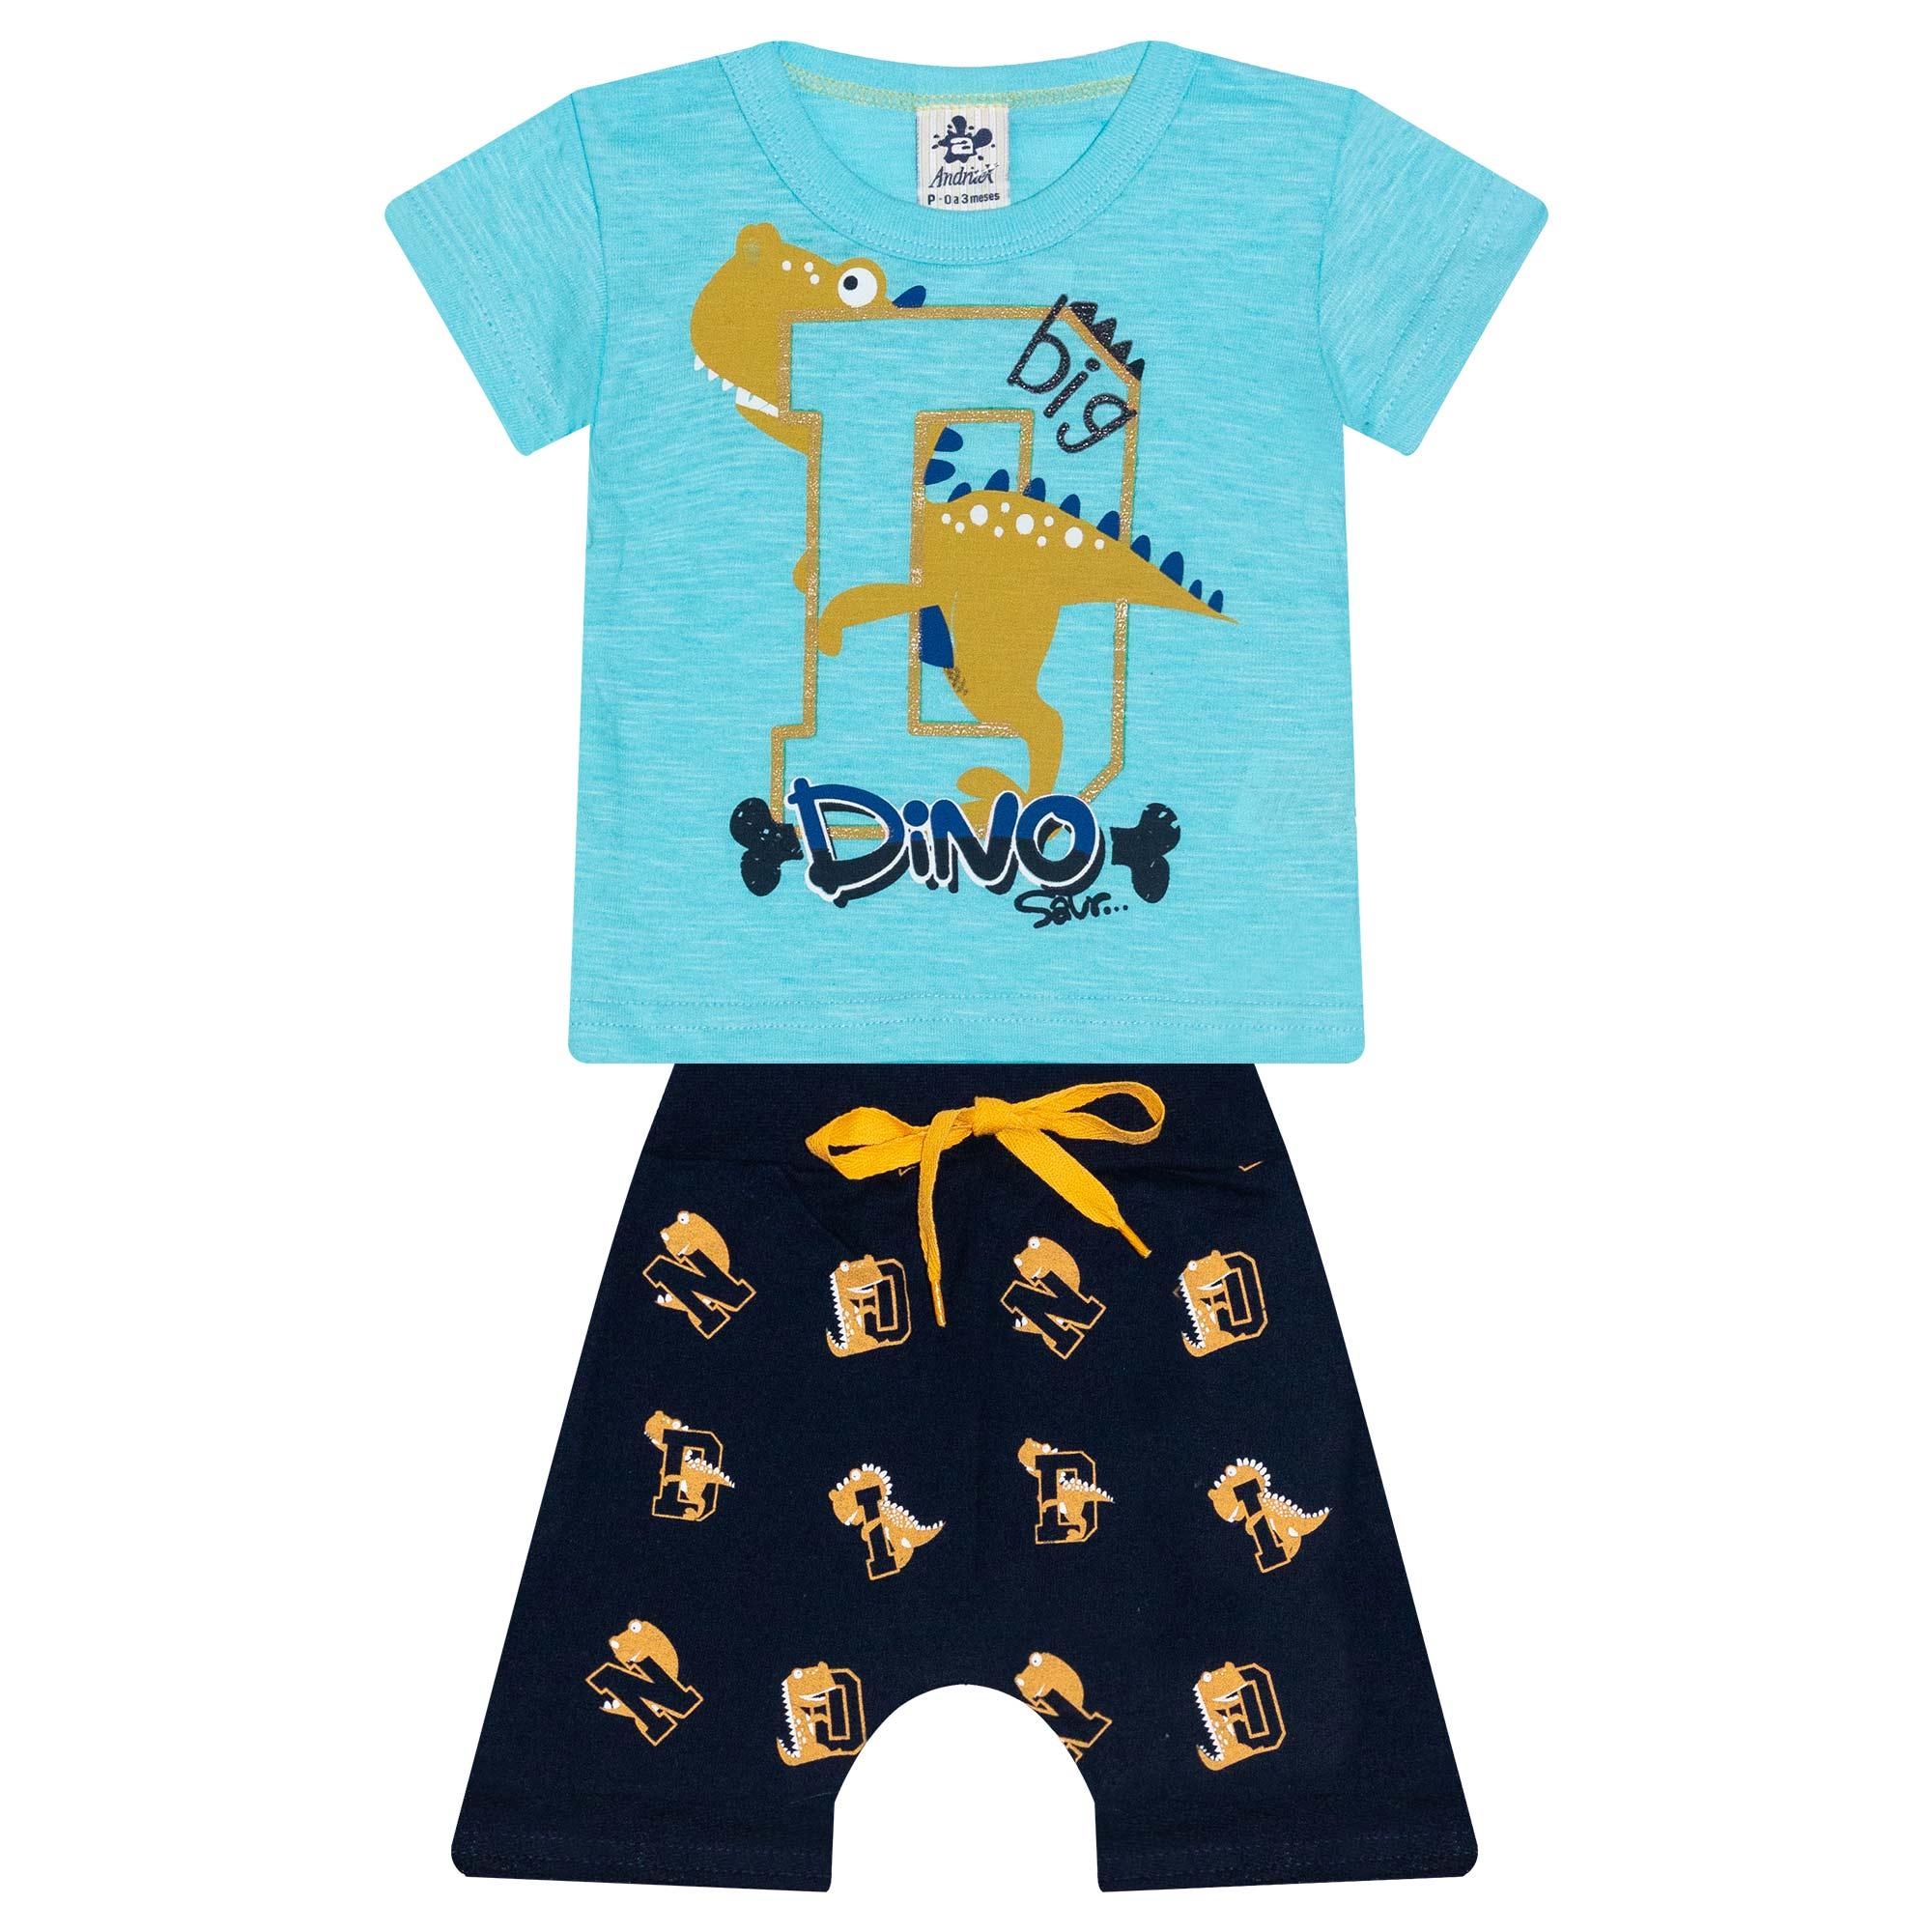 Conjunto Infantil Masculino Dinos Big - Ref 4815 - Azul - Andritex